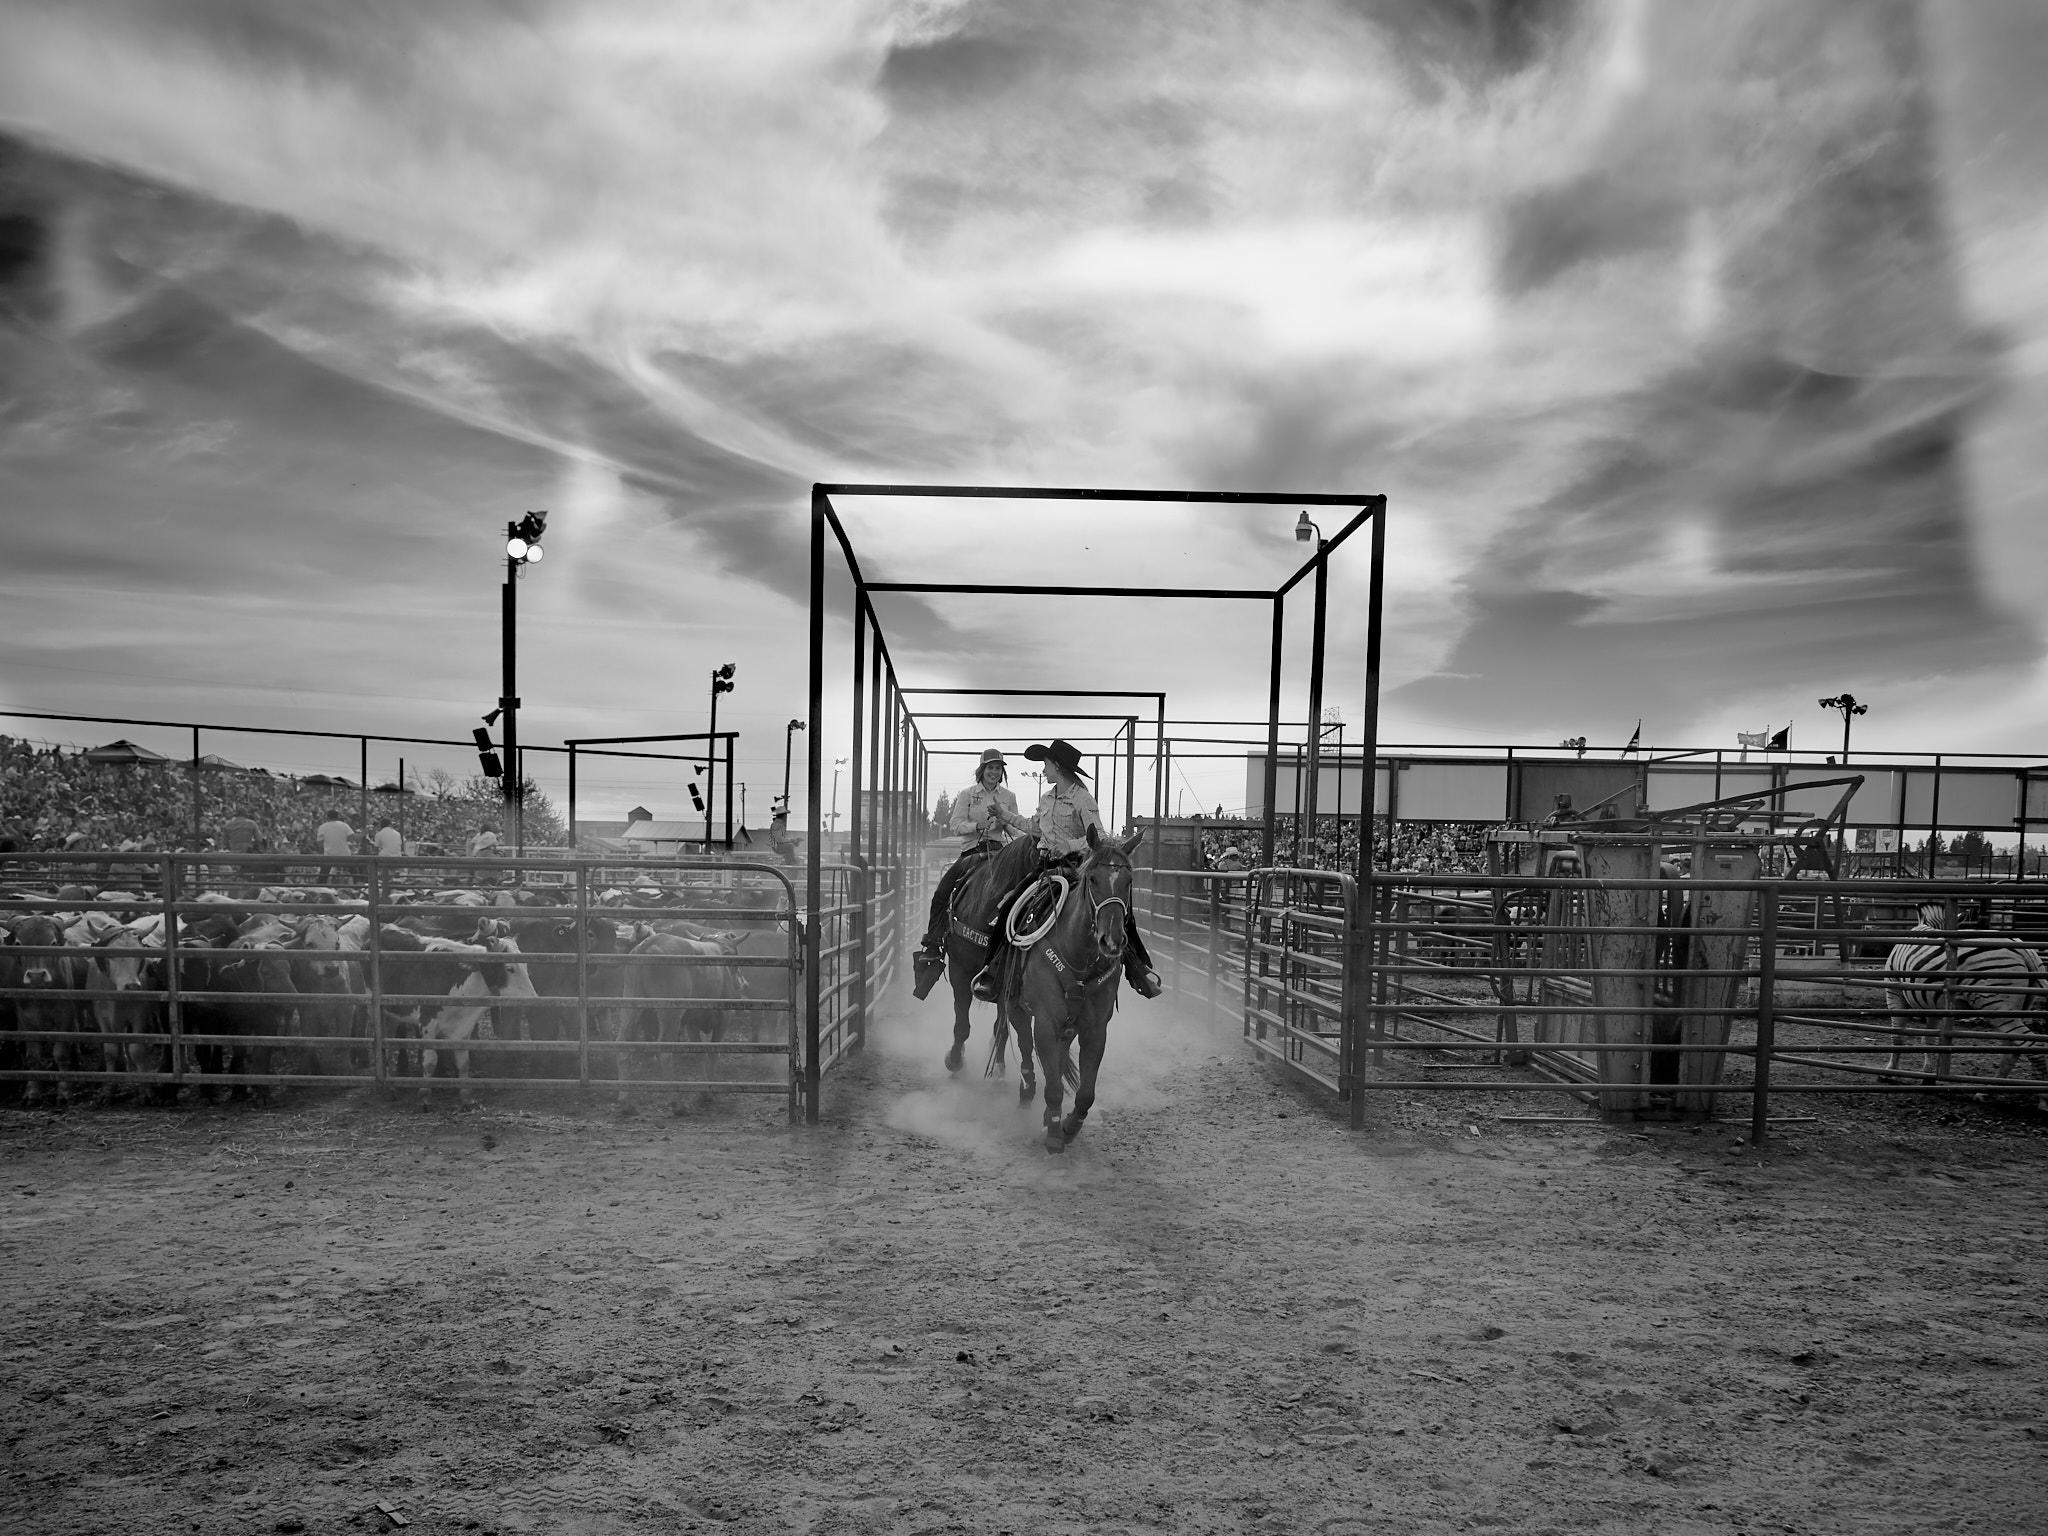 Rodeo_2019_971.jpg